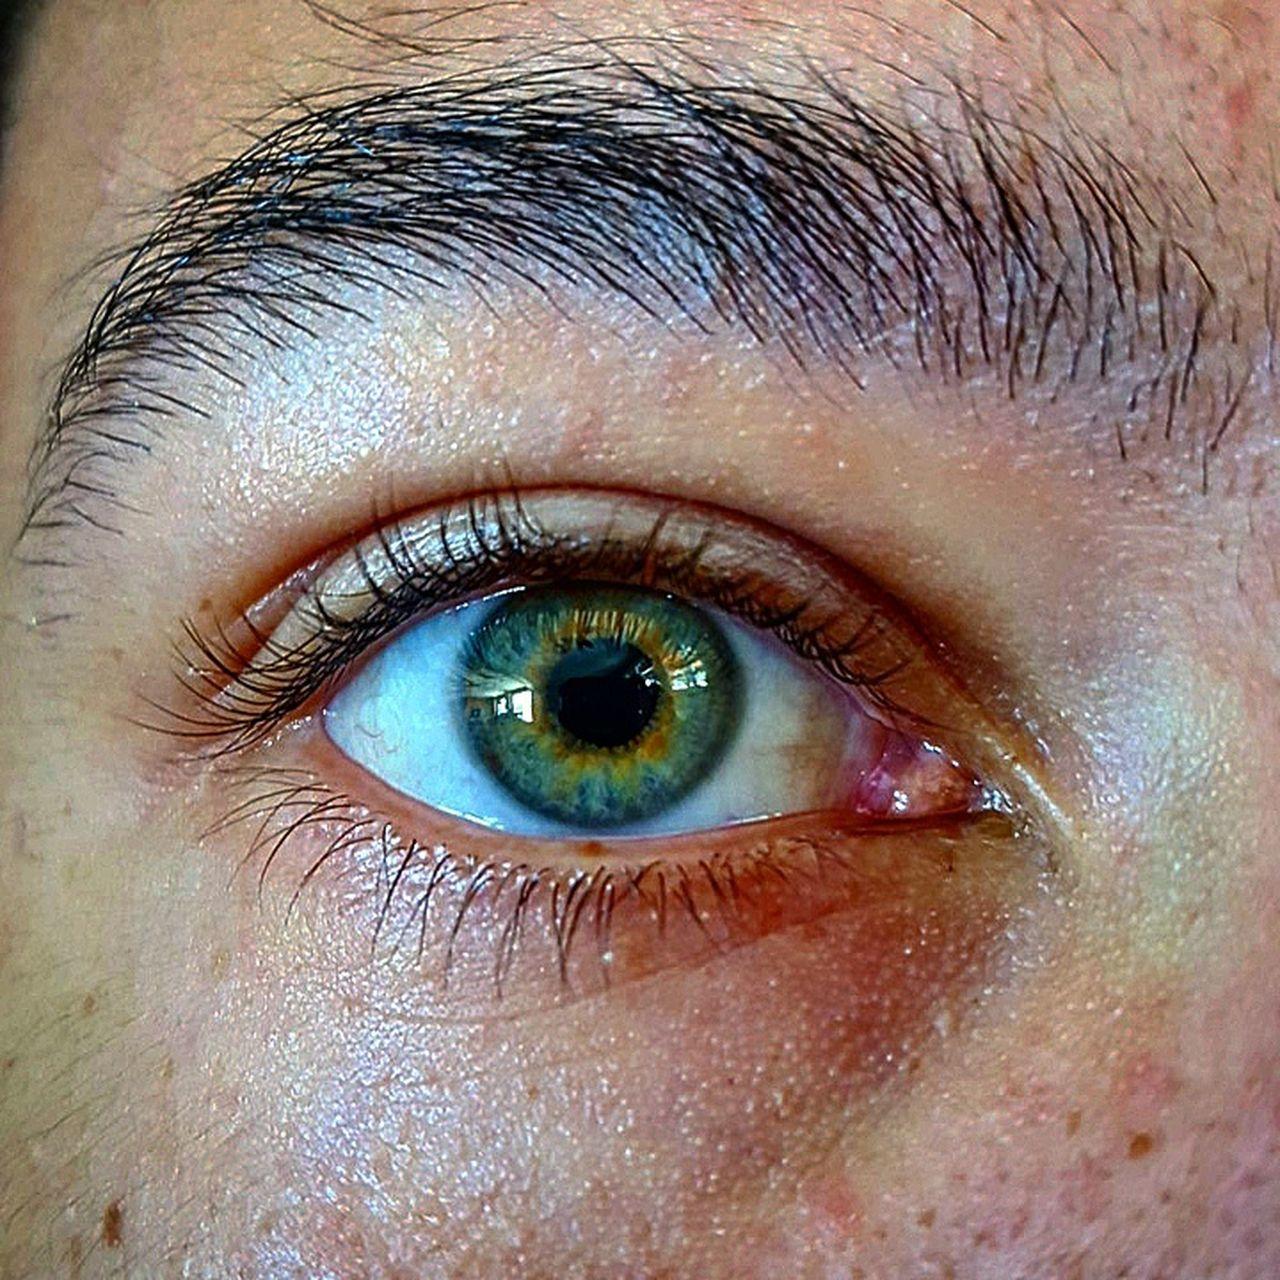 human eye, human body part, eyelash, looking at camera, eyesight, blue eyes, eyeball, one person, eyebrow, iris - eye, close-up, sensory perception, portrait, human skin, real people, adult, people, adults only, one woman only, hazel eyes, outdoors, day